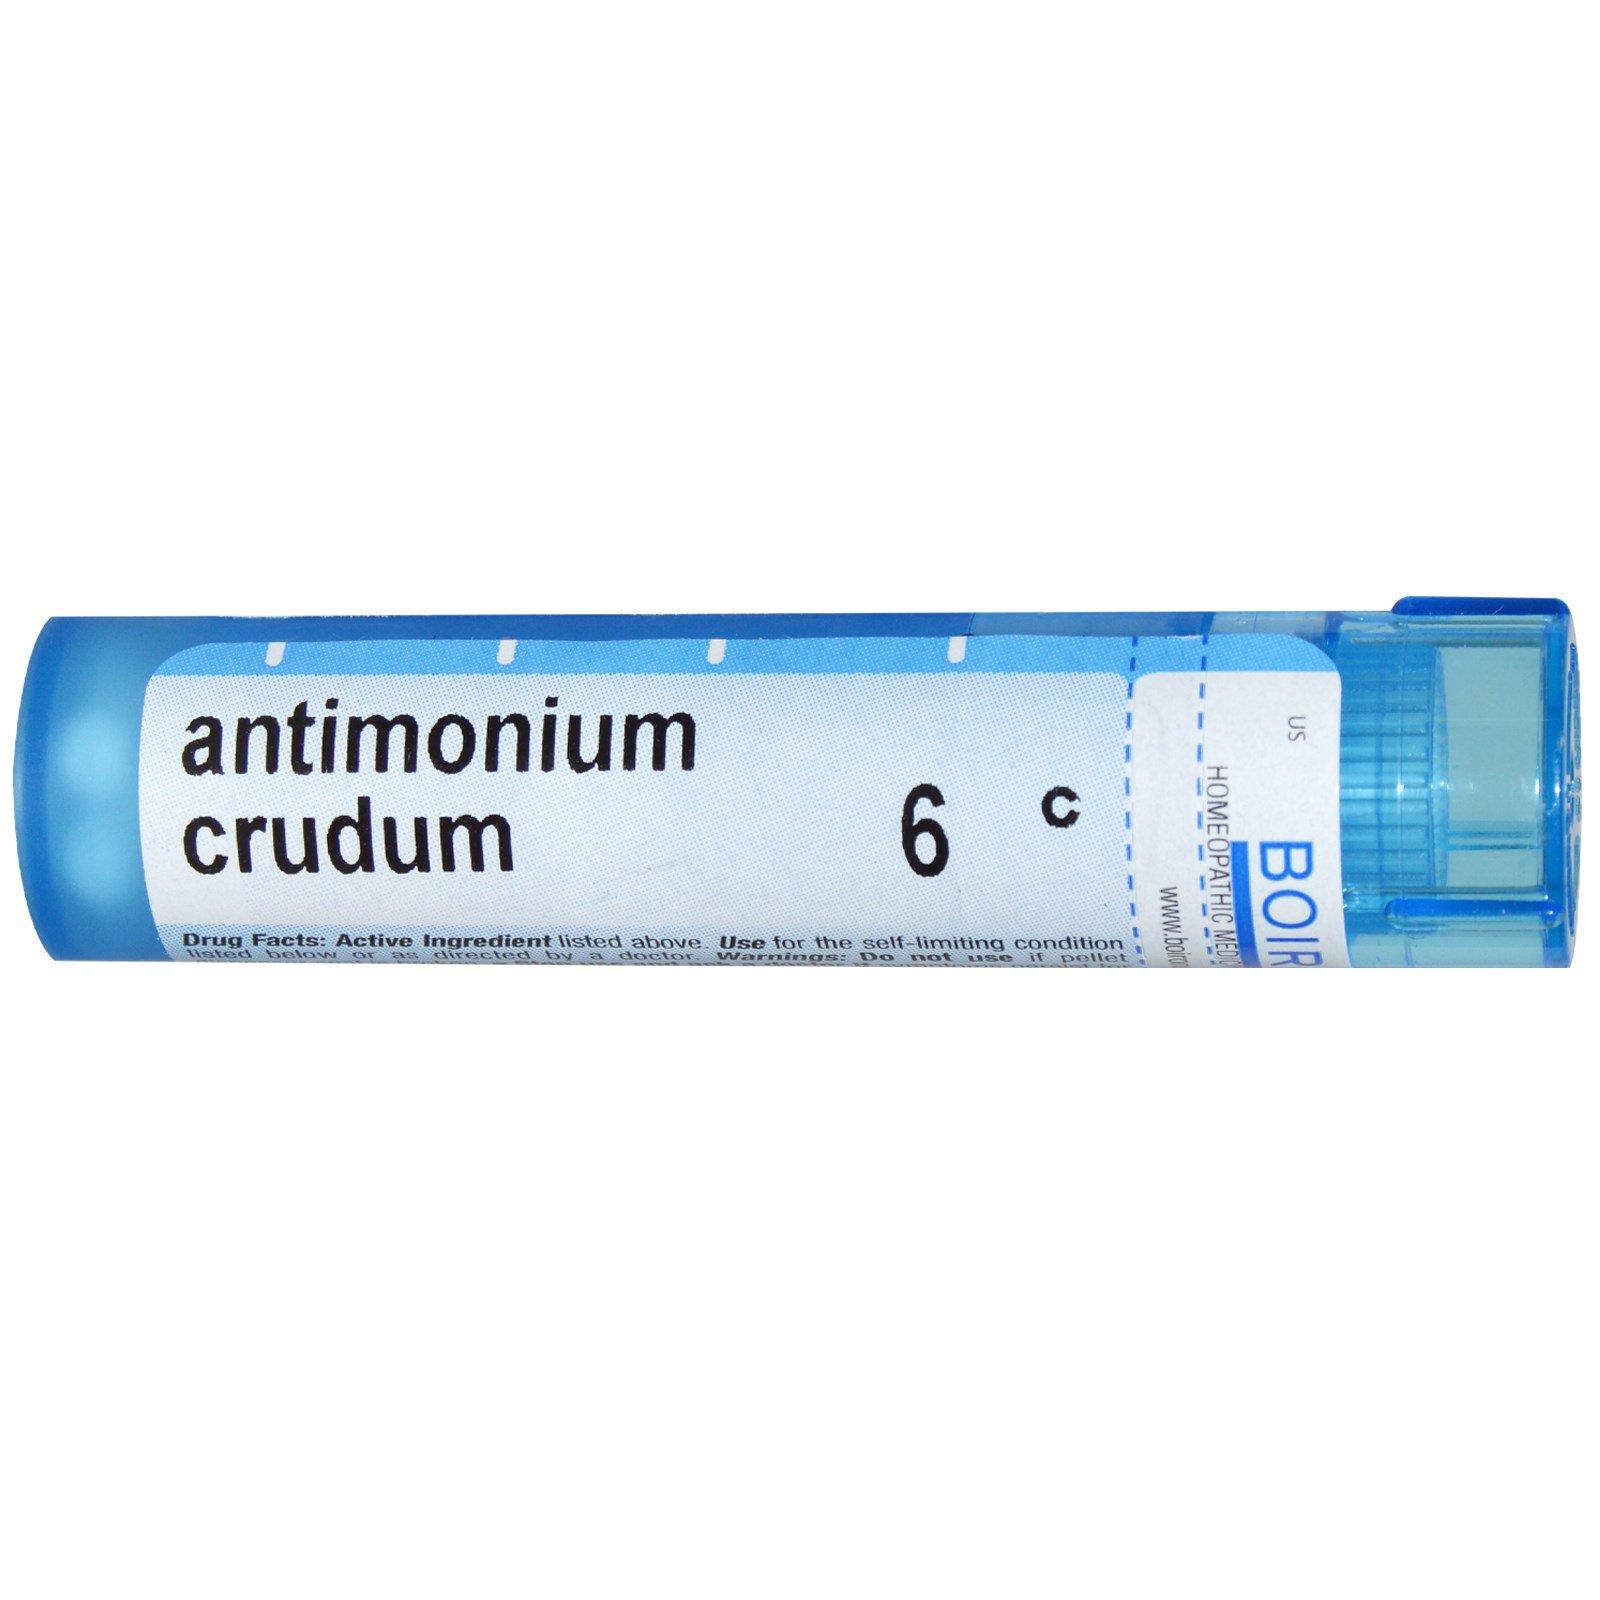 Boiron, Single Remedies, Антимониум крудум, 6C, прибл. 80 гранул